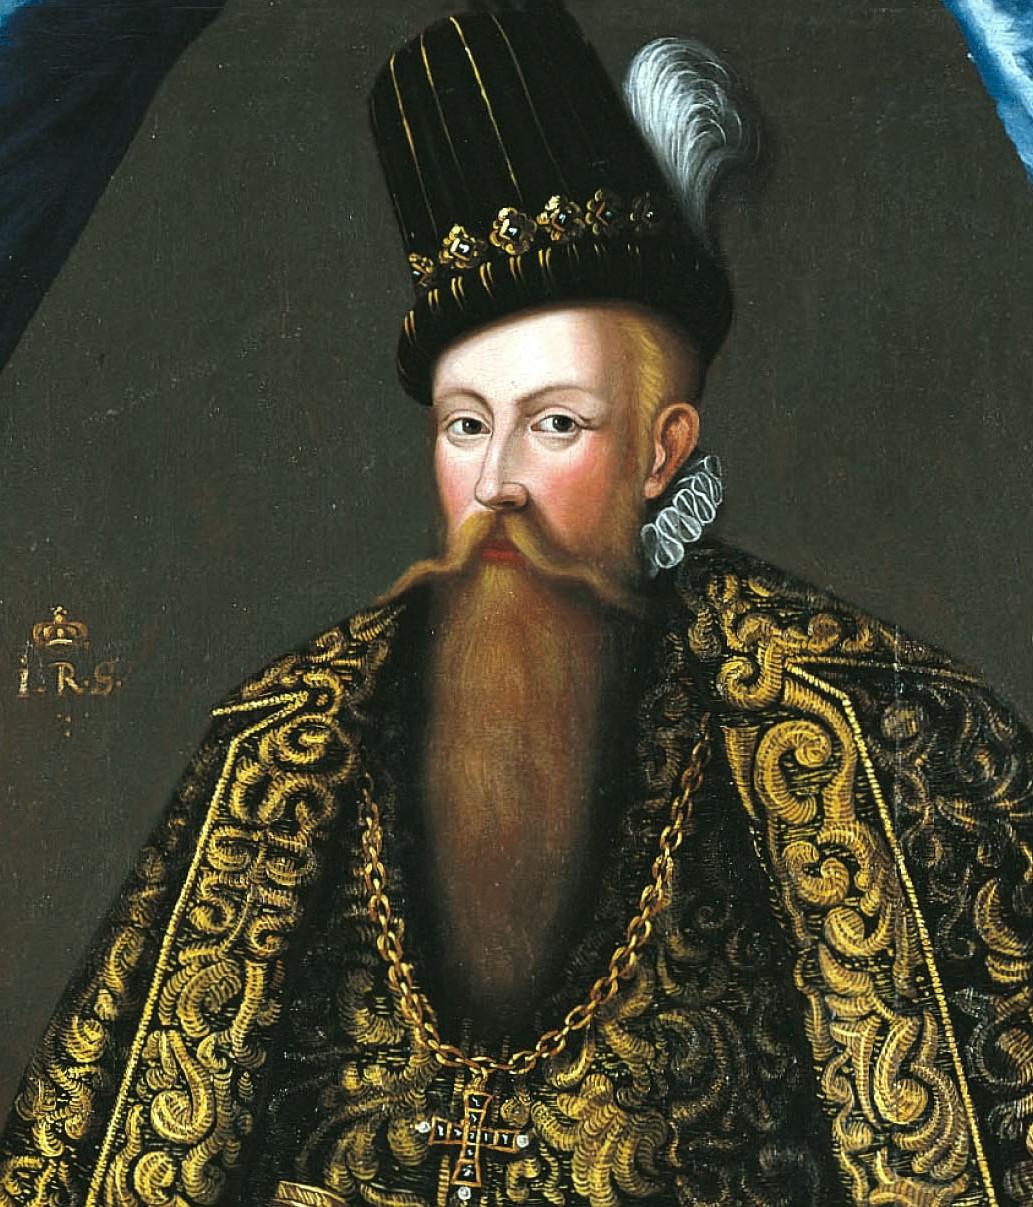 File:John III of Sweden.jpg